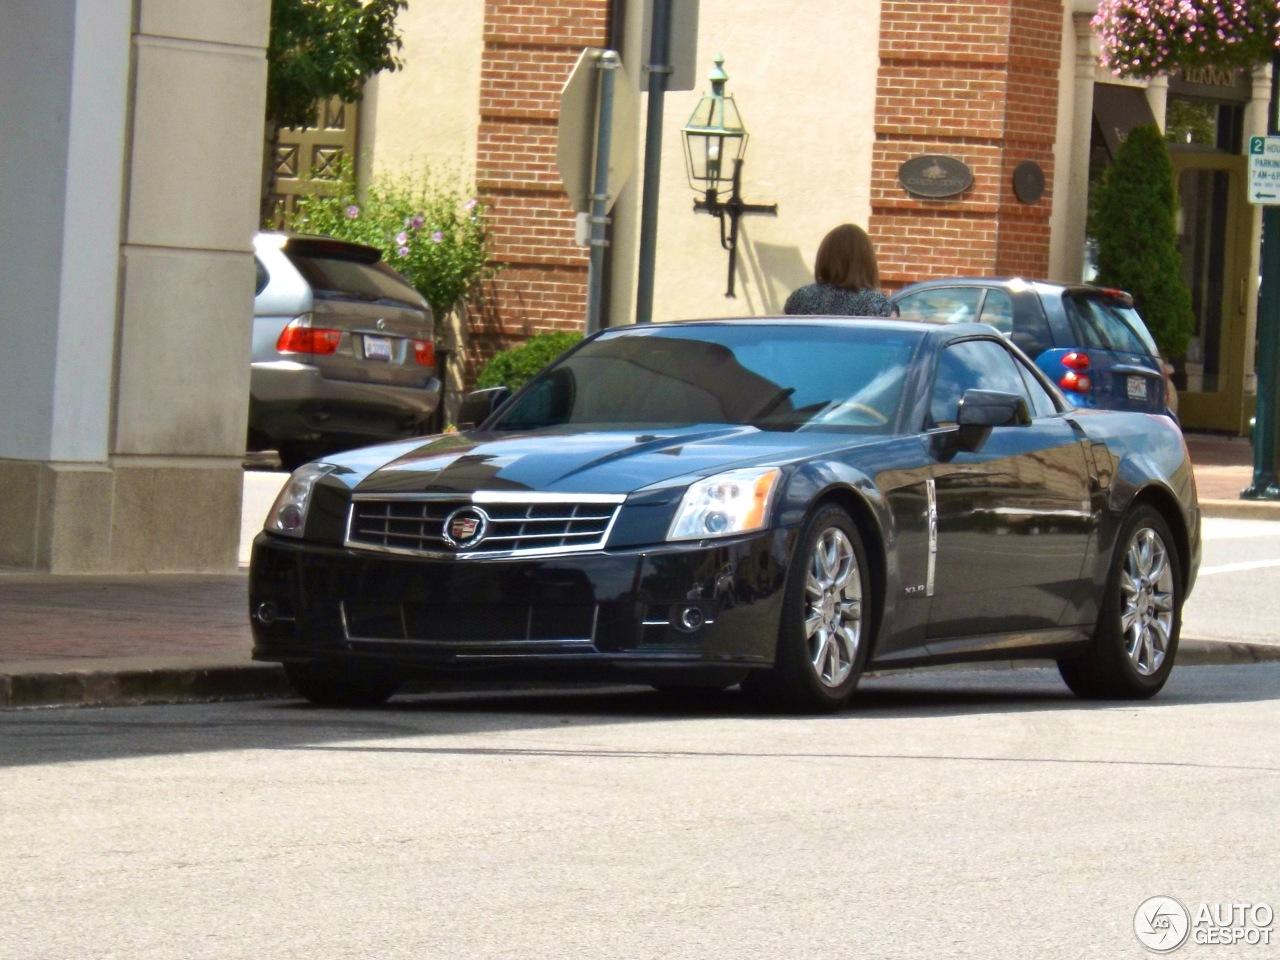 Cadillac Xlr Platinum Edition 5 October 2013 Autogespot